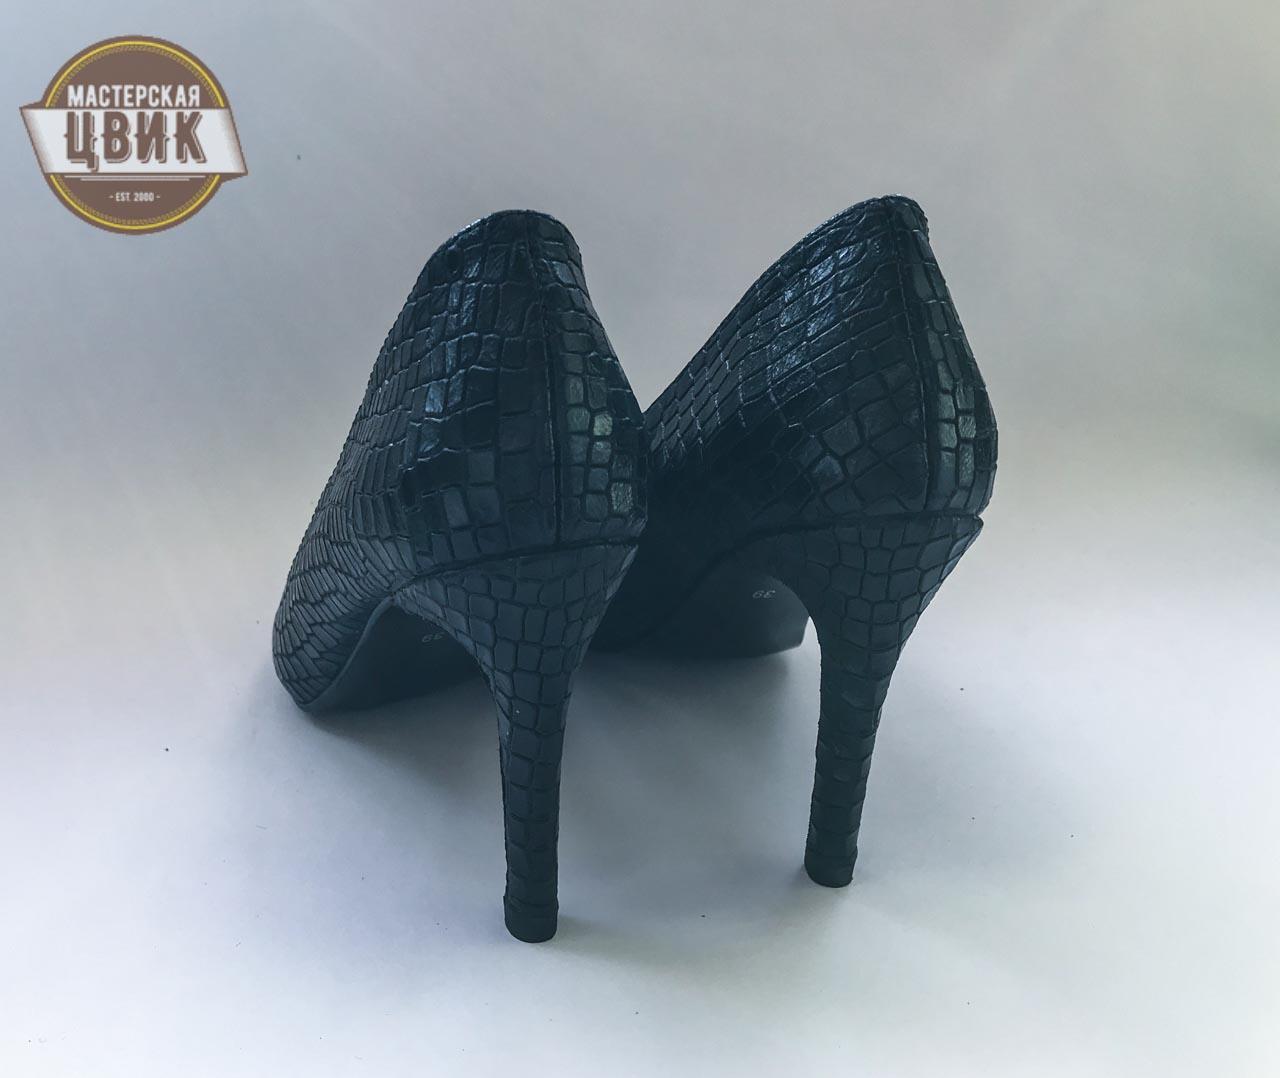 individualnyj-poshiv-obuvi-minsk-38 Индивидуальный пошив обуви